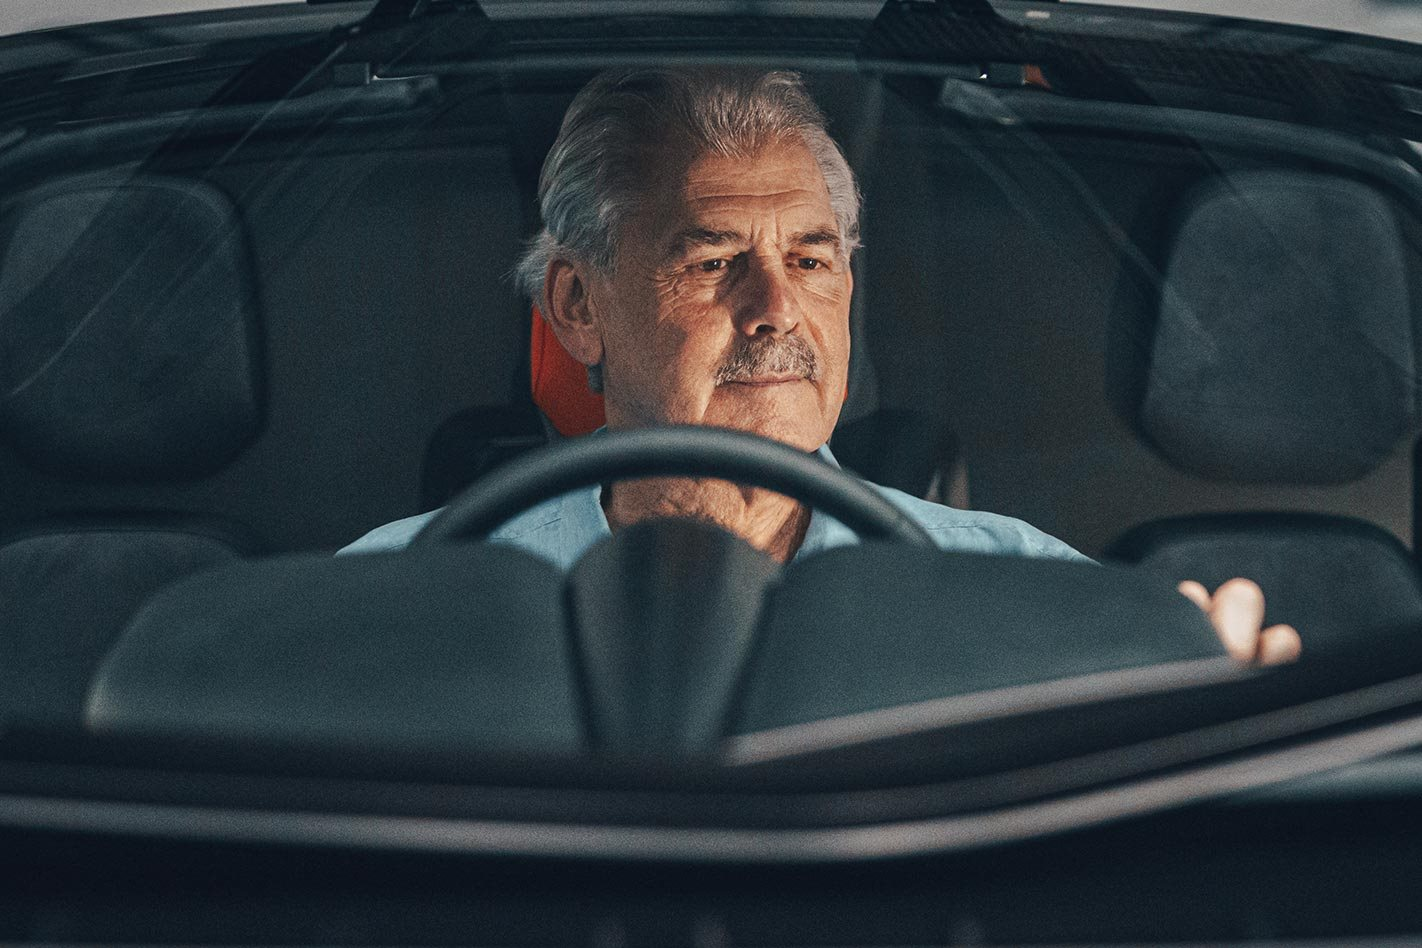 About Gordon Murray: A brief biography of the legendary car designer